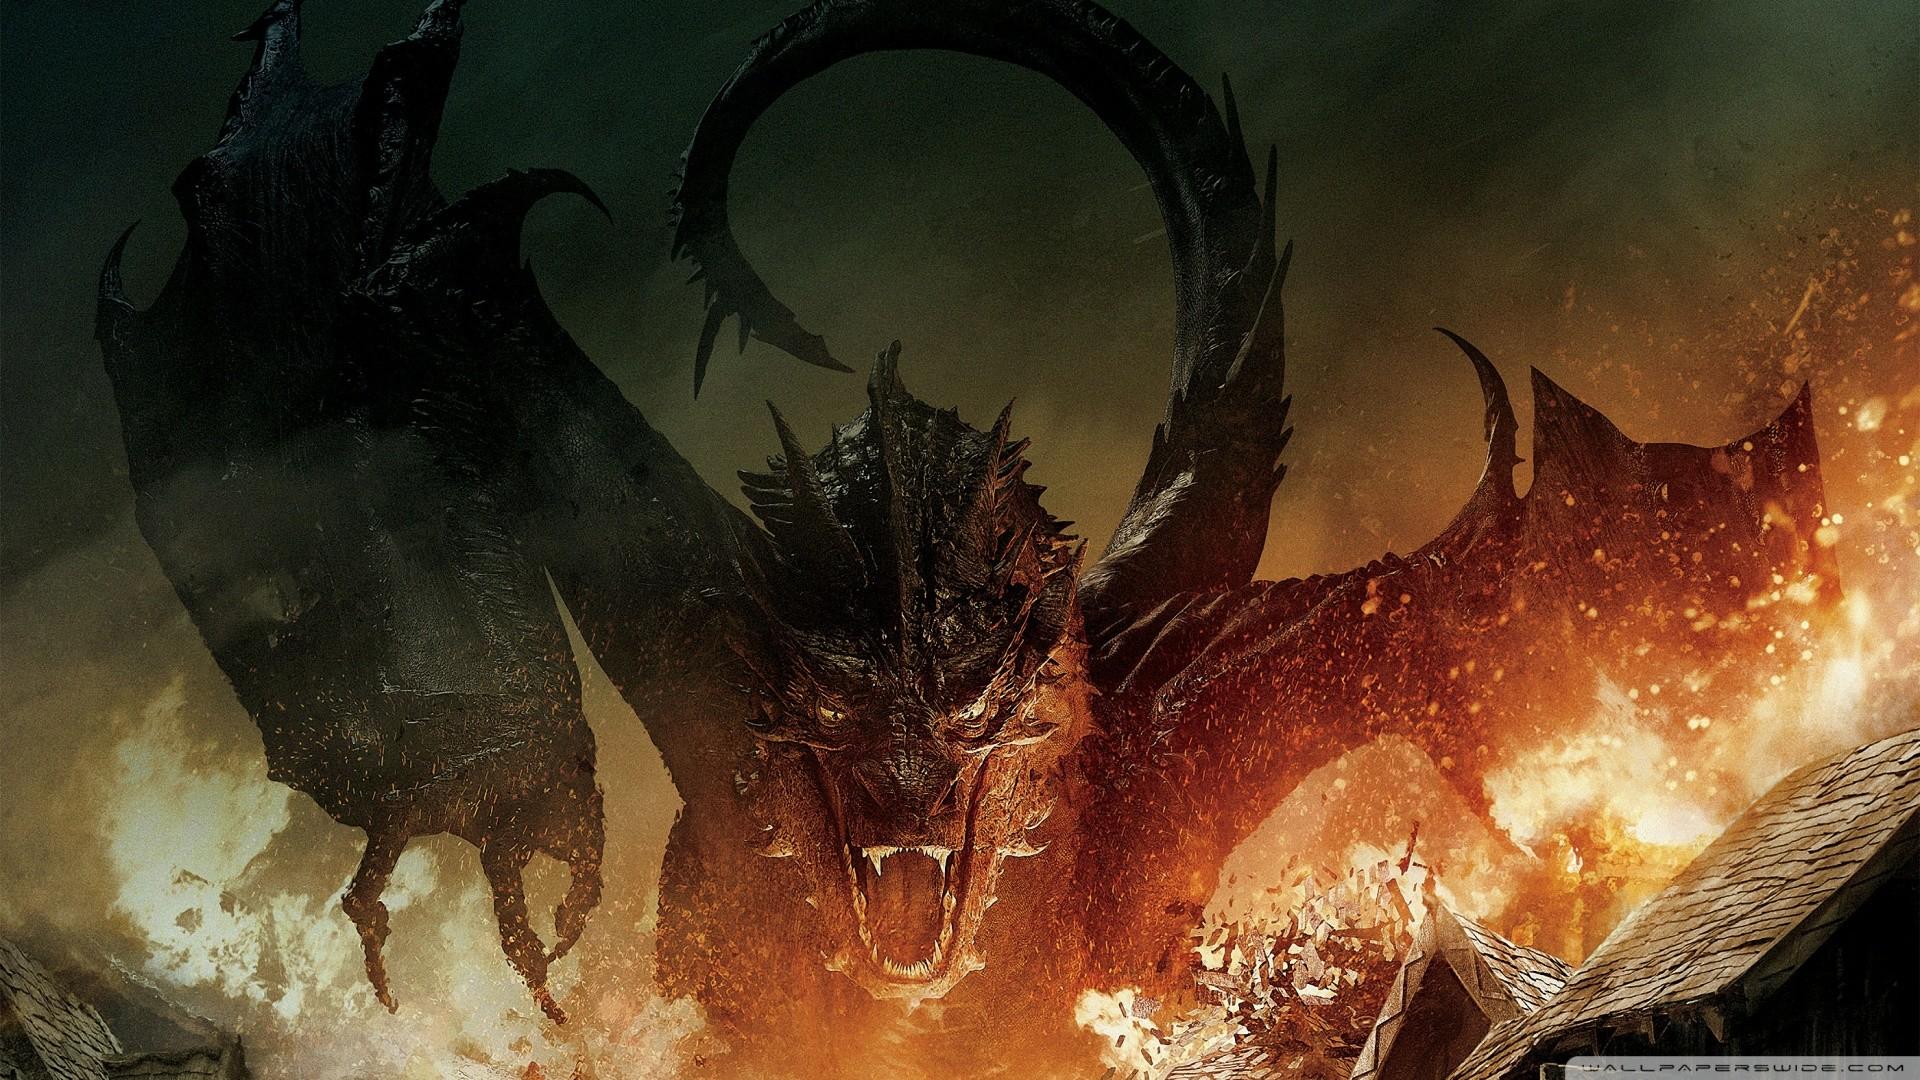 The Hobbit The Battle Of The Five Armies Wallpaper Desktop